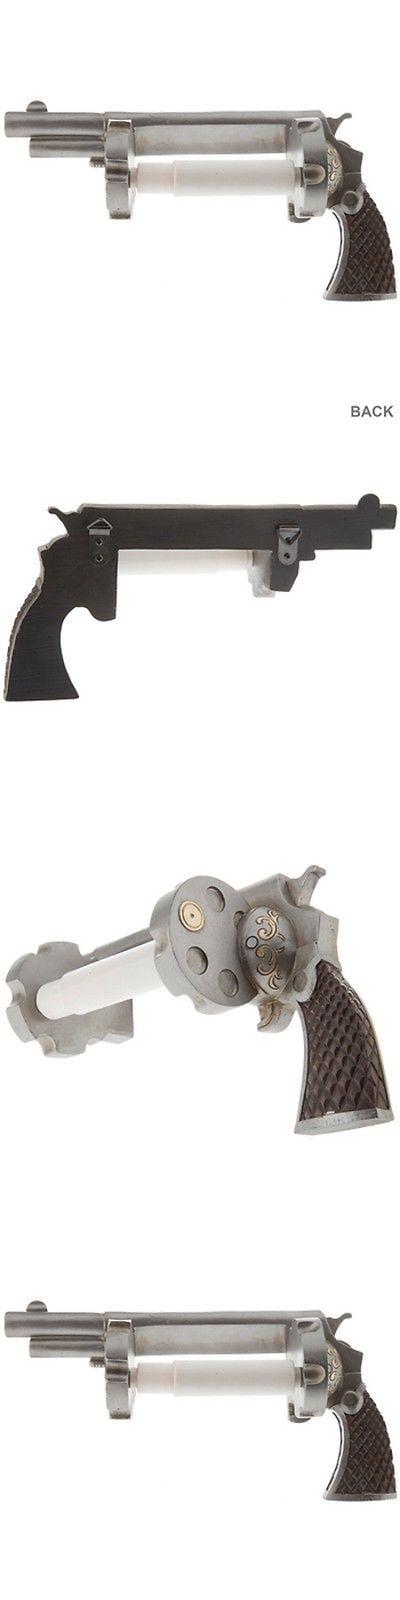 Advertisements 71132: Revolver Pistol Toilet Paper Holder Cowboy Ammo Gun Man Cave Bathroom Decor Part -> BUY IT NOW ONLY: $32.99 on eBay!